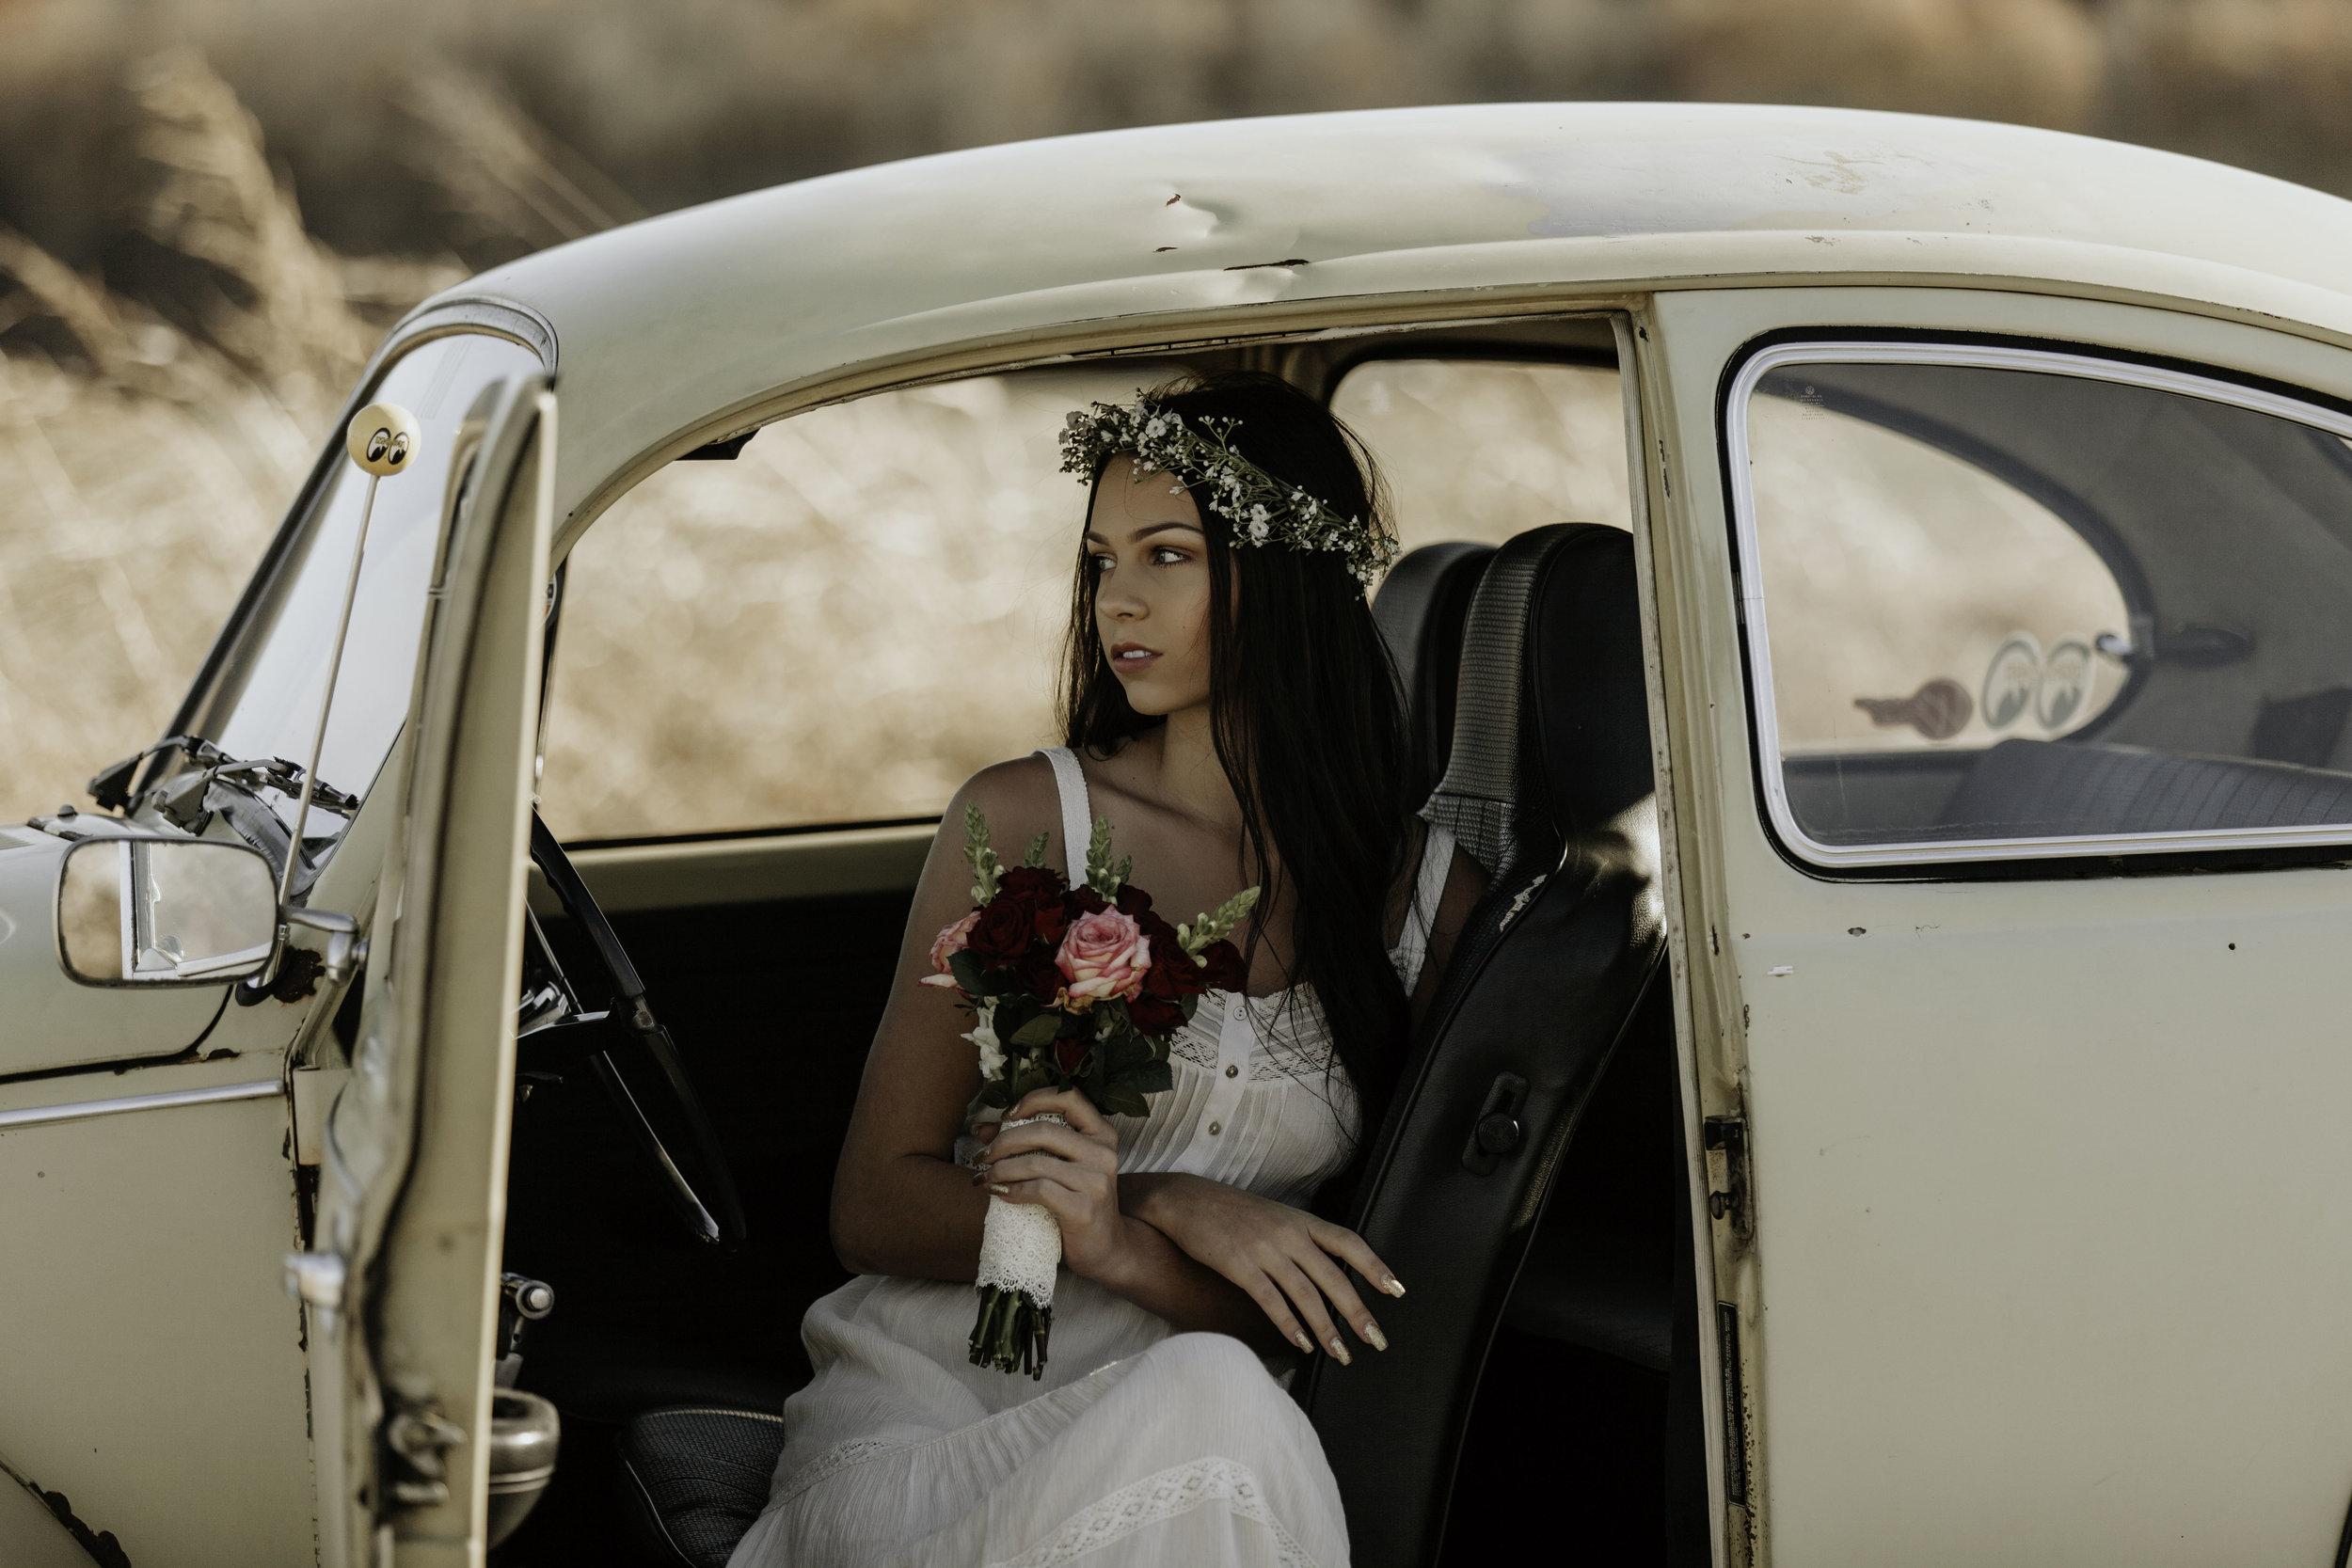 dessert-conway-central-arkansas-bridal-photographer-little-rock-photography-outdoor-wedding-boho-fashion-engagement-elopement-bouquet-bride-soiree-magazine-photoshoot-arkansasbride-pinnacle-mountain-car-vintage